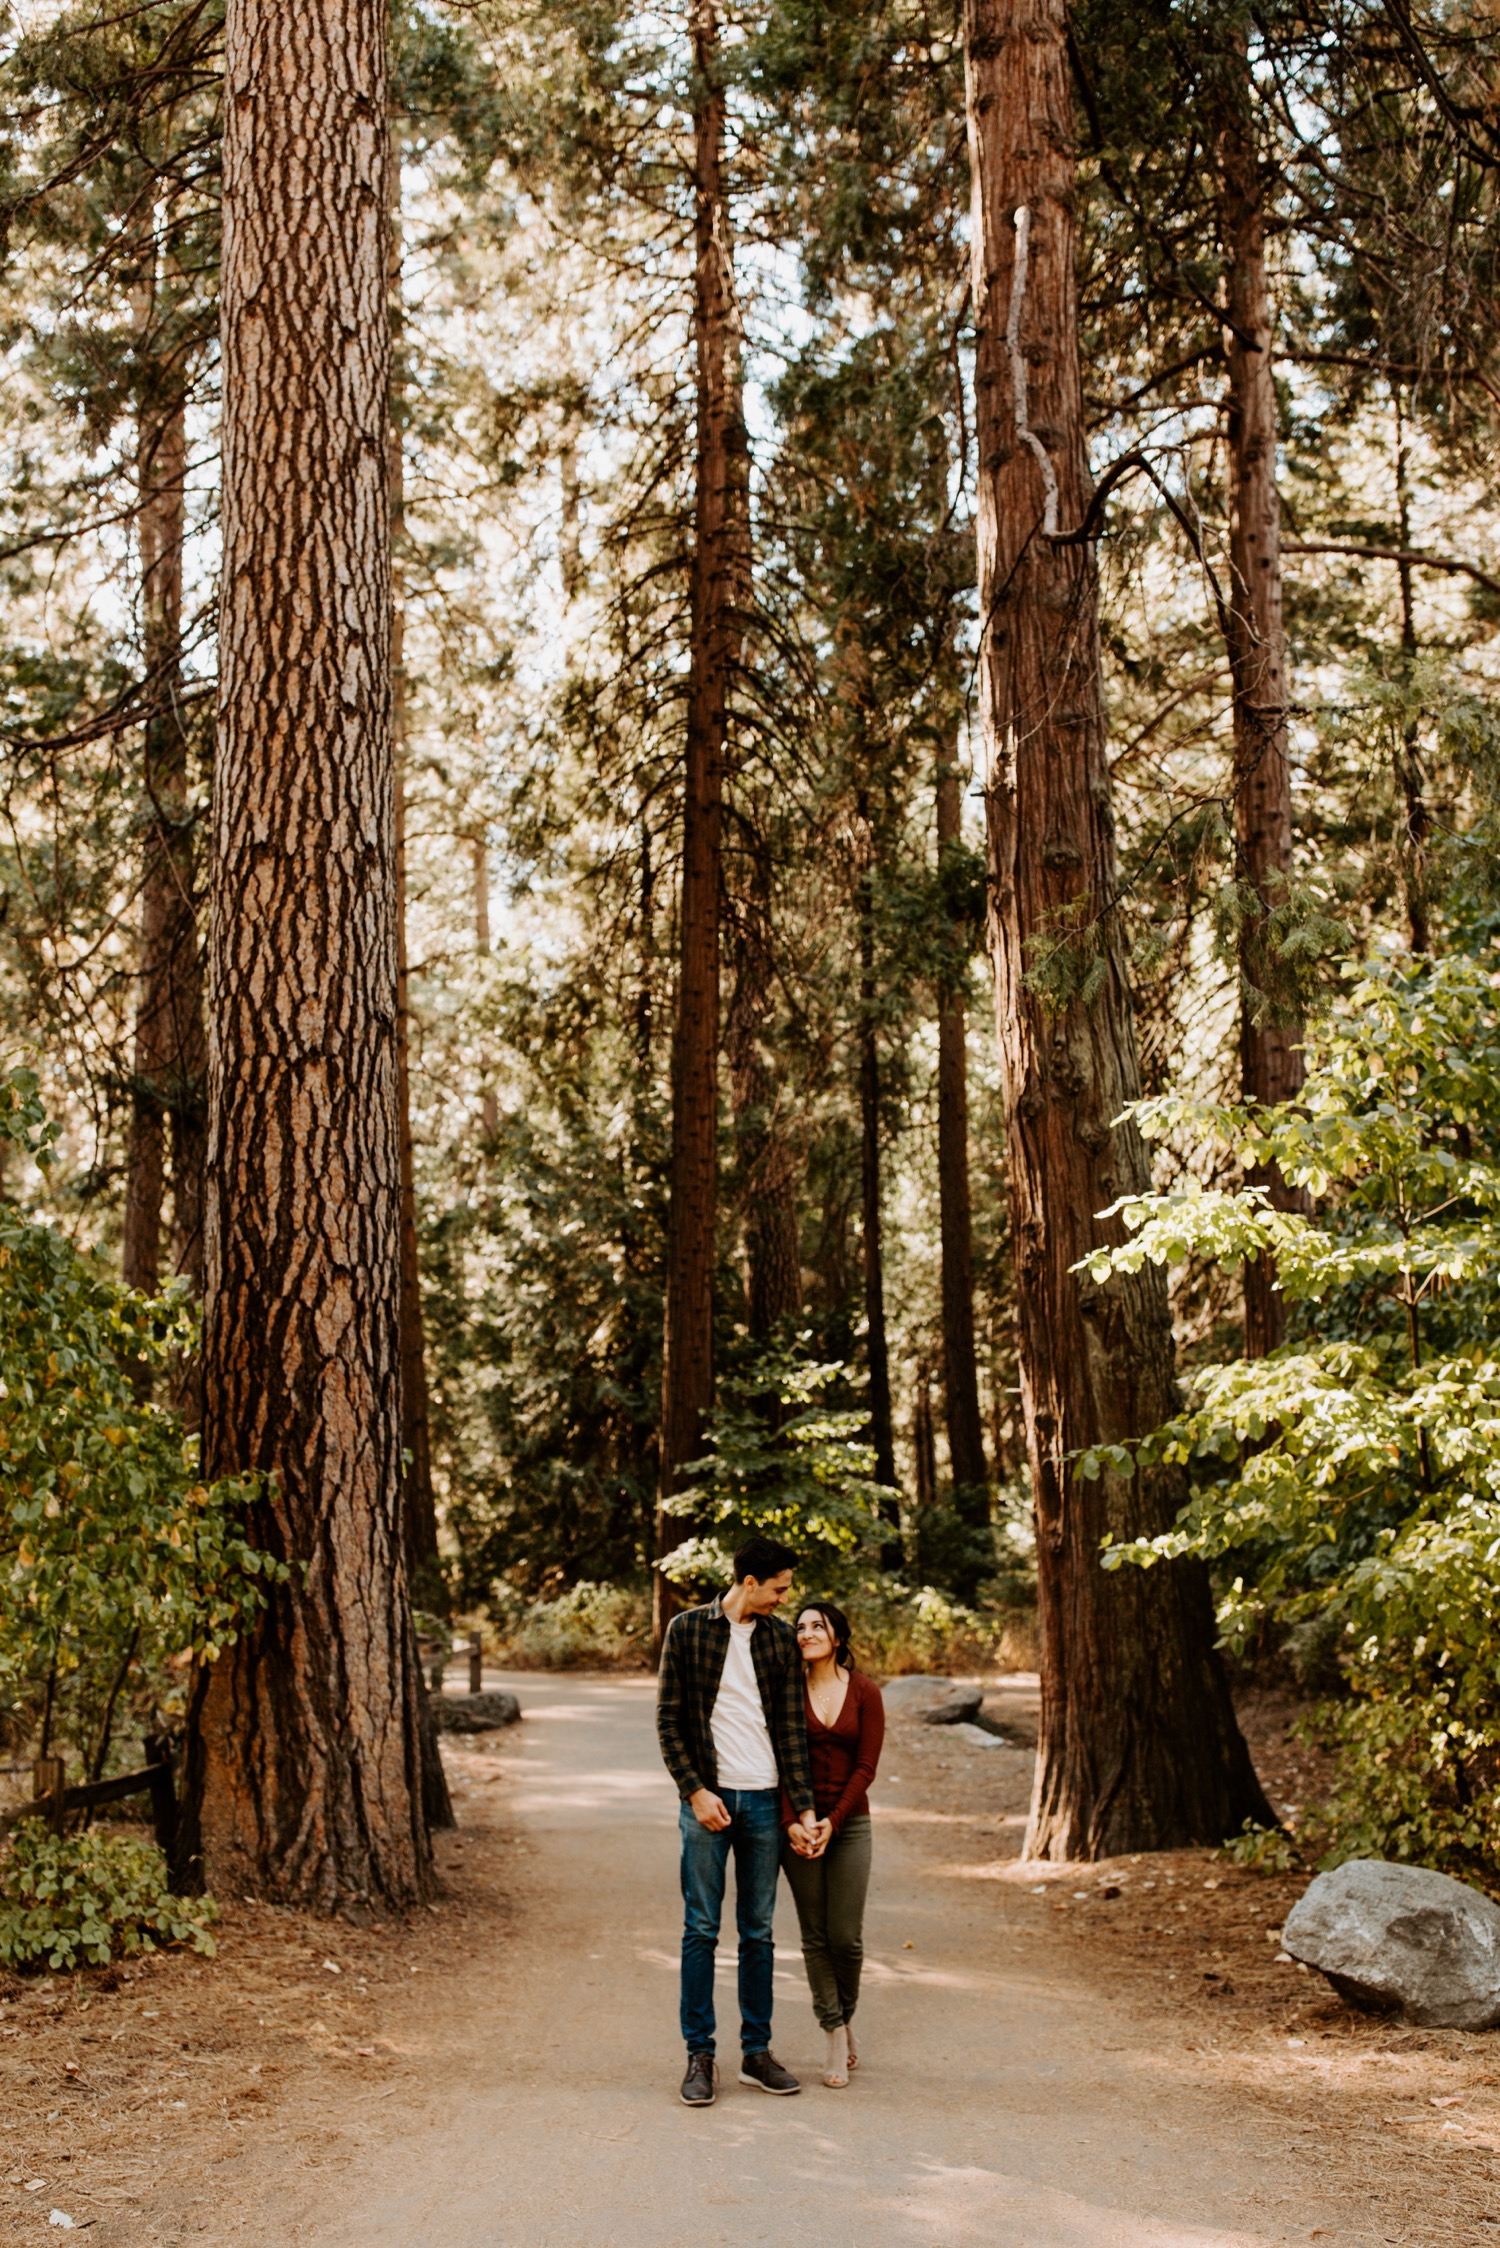 Couple standing in pine tree grove in Yosemite